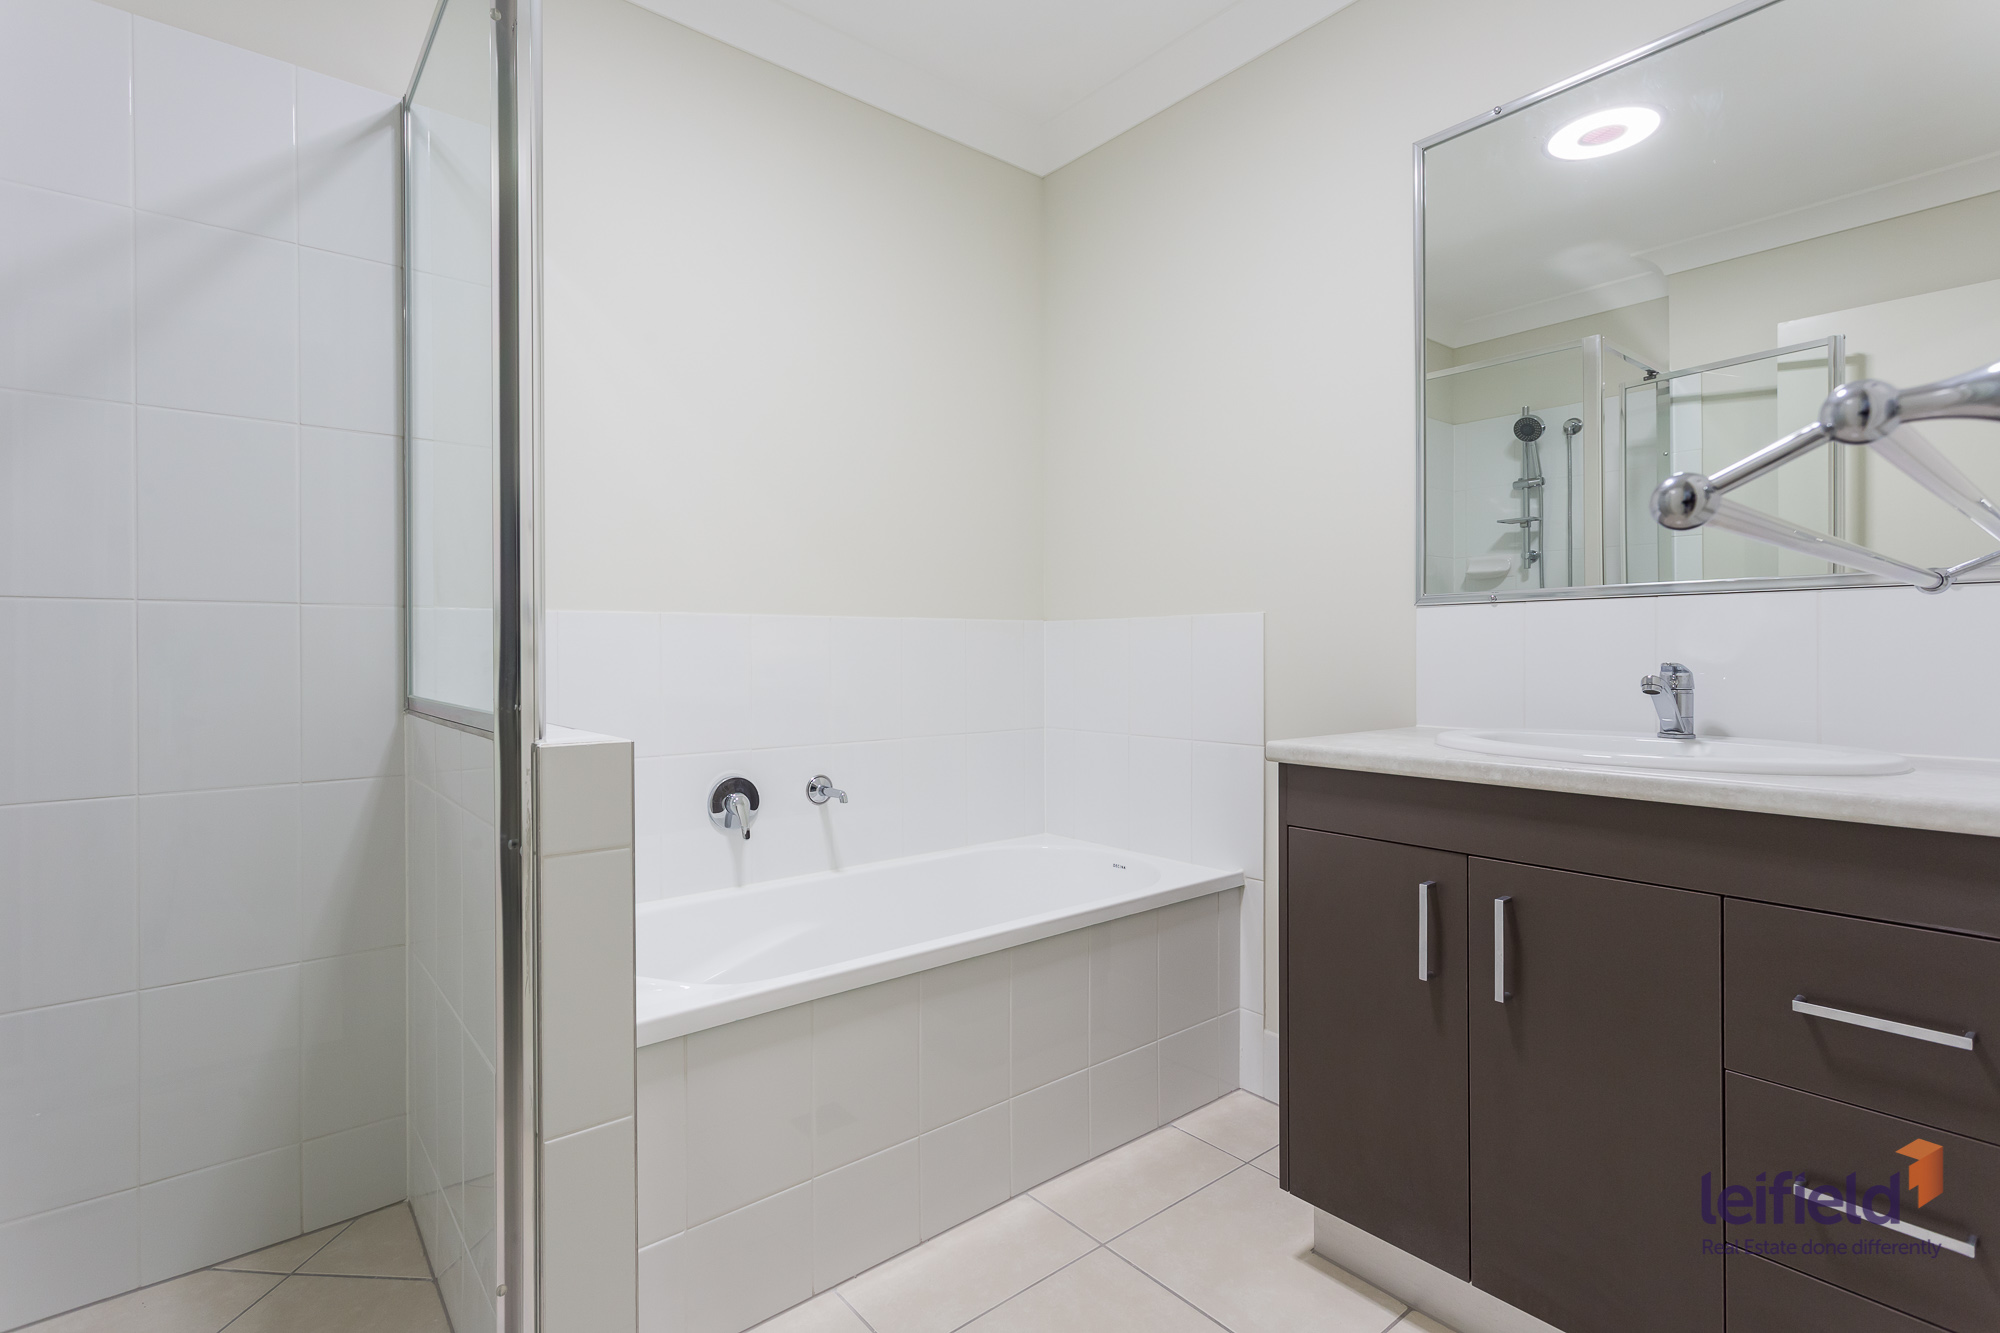 1/44 Kanimbla St, Holmview, QLD 4207